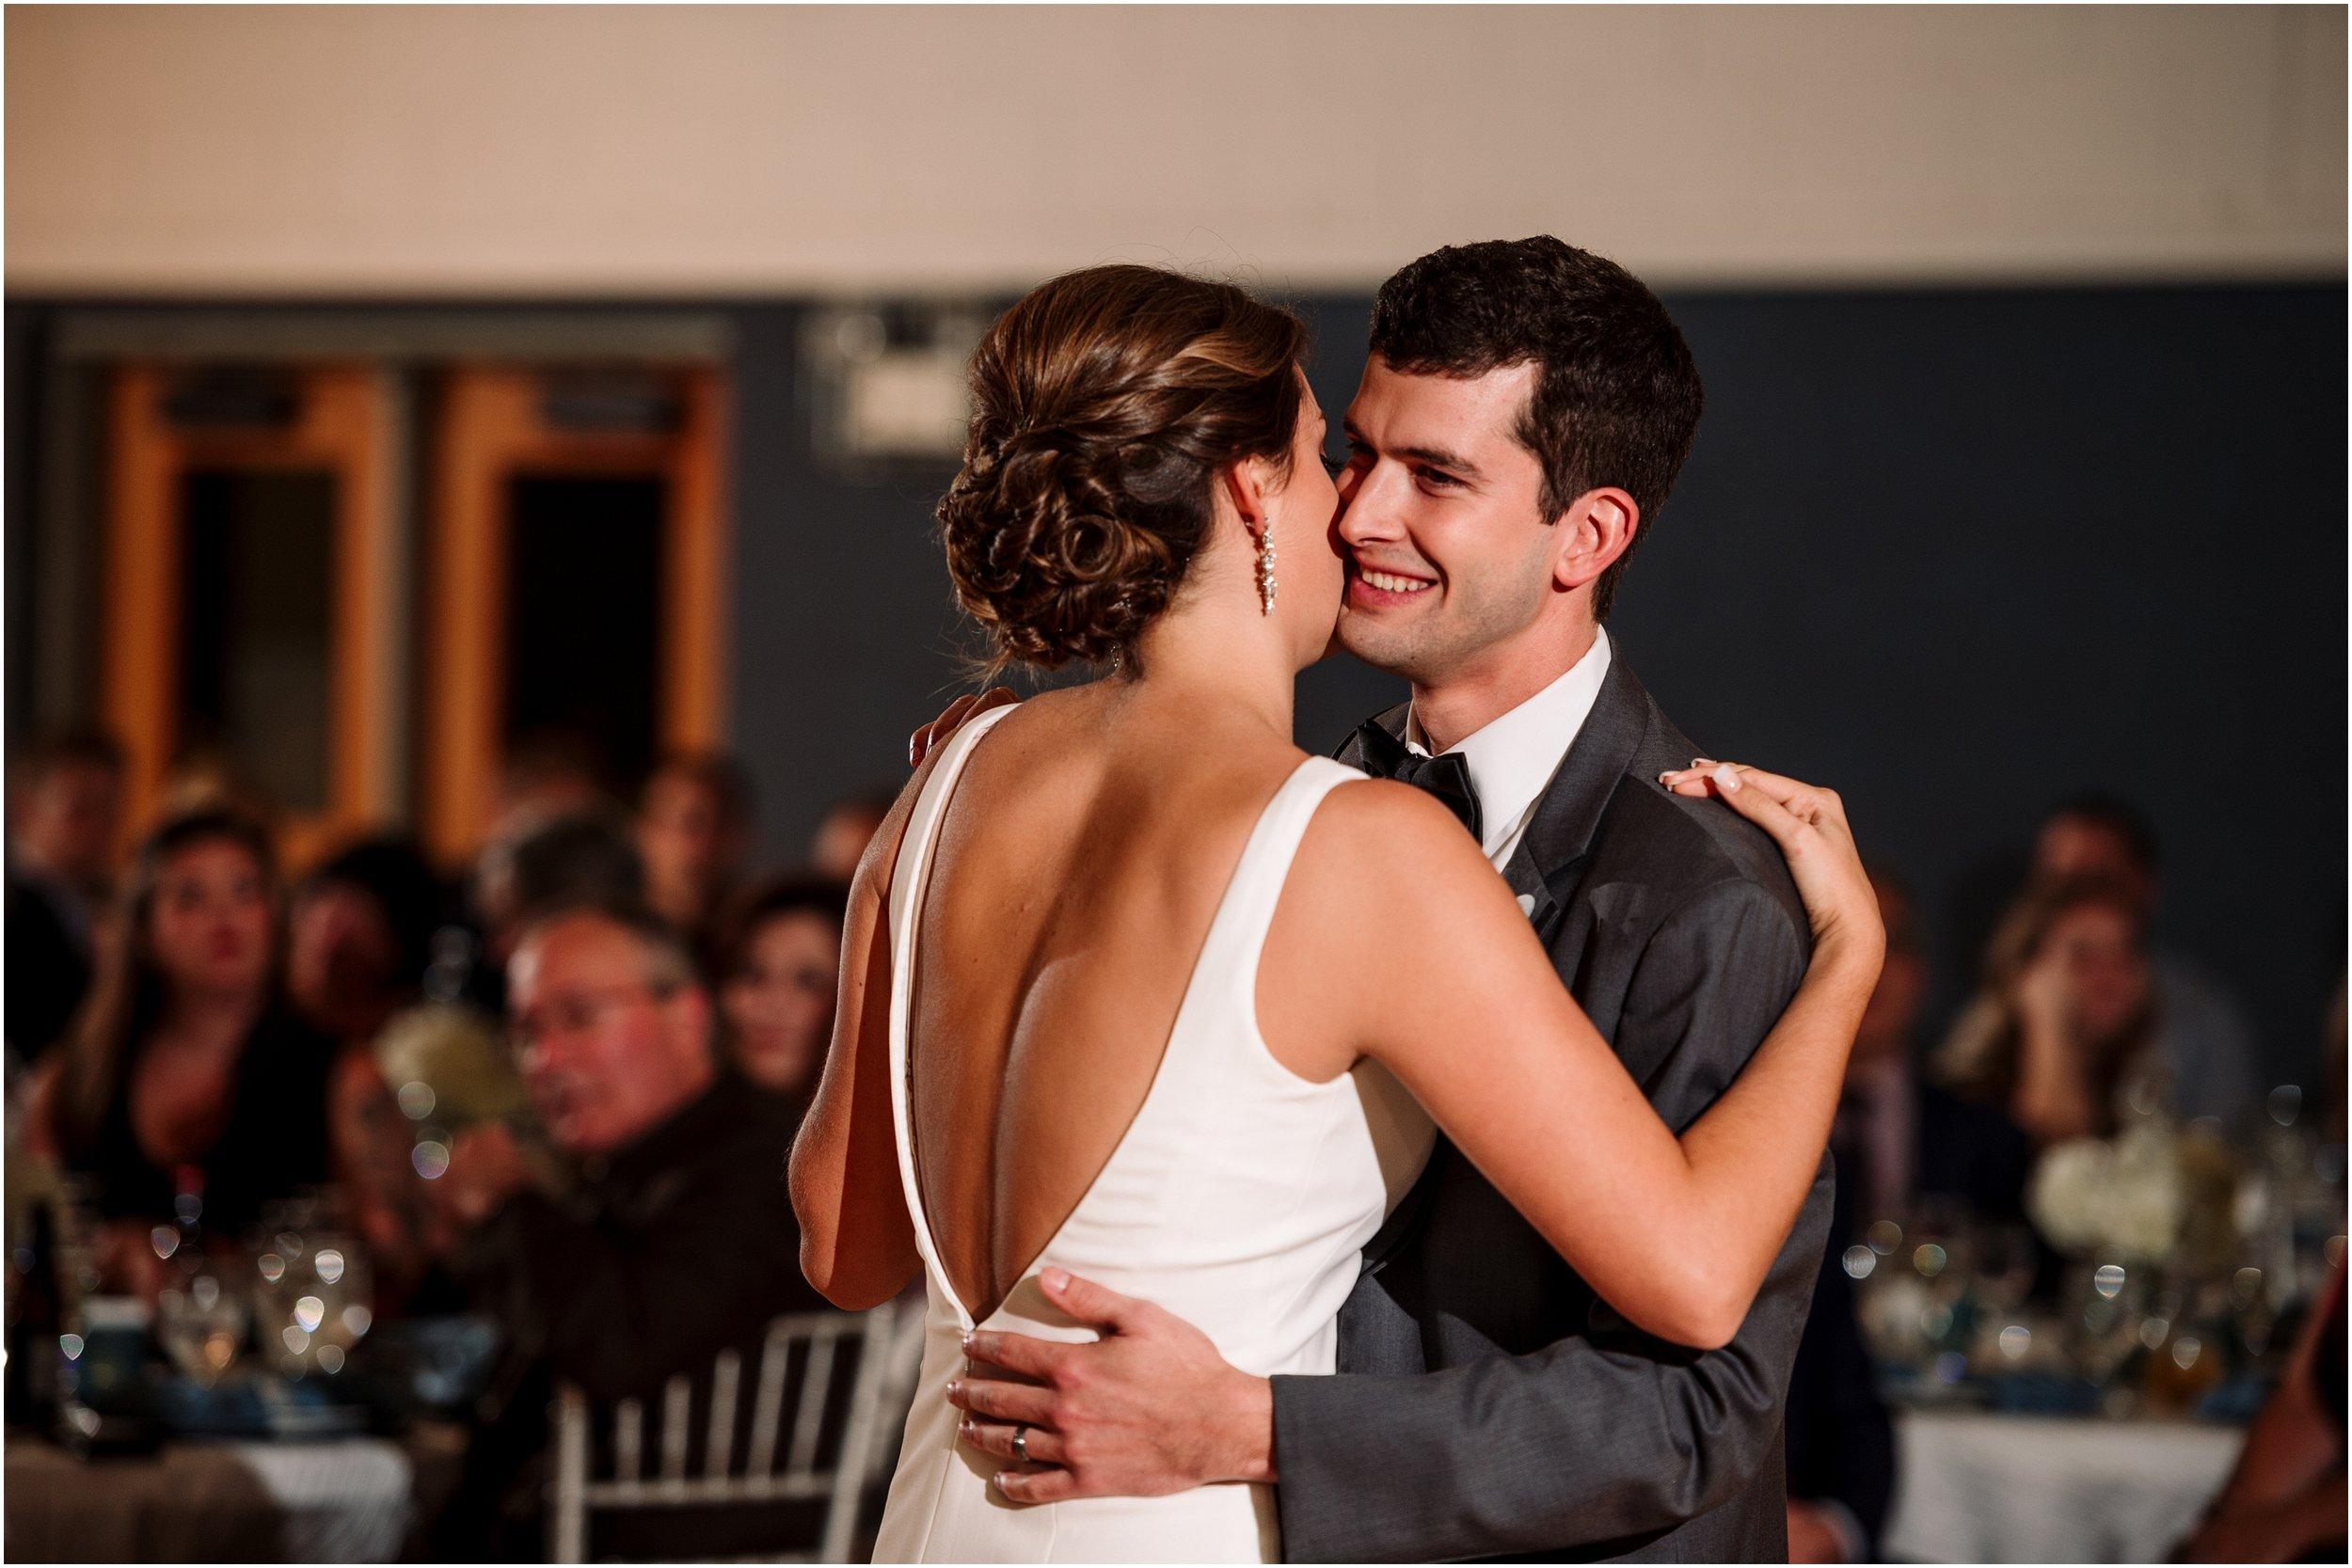 hannah leigh photography ellicott city church wedding baltimore md_2166.jpg